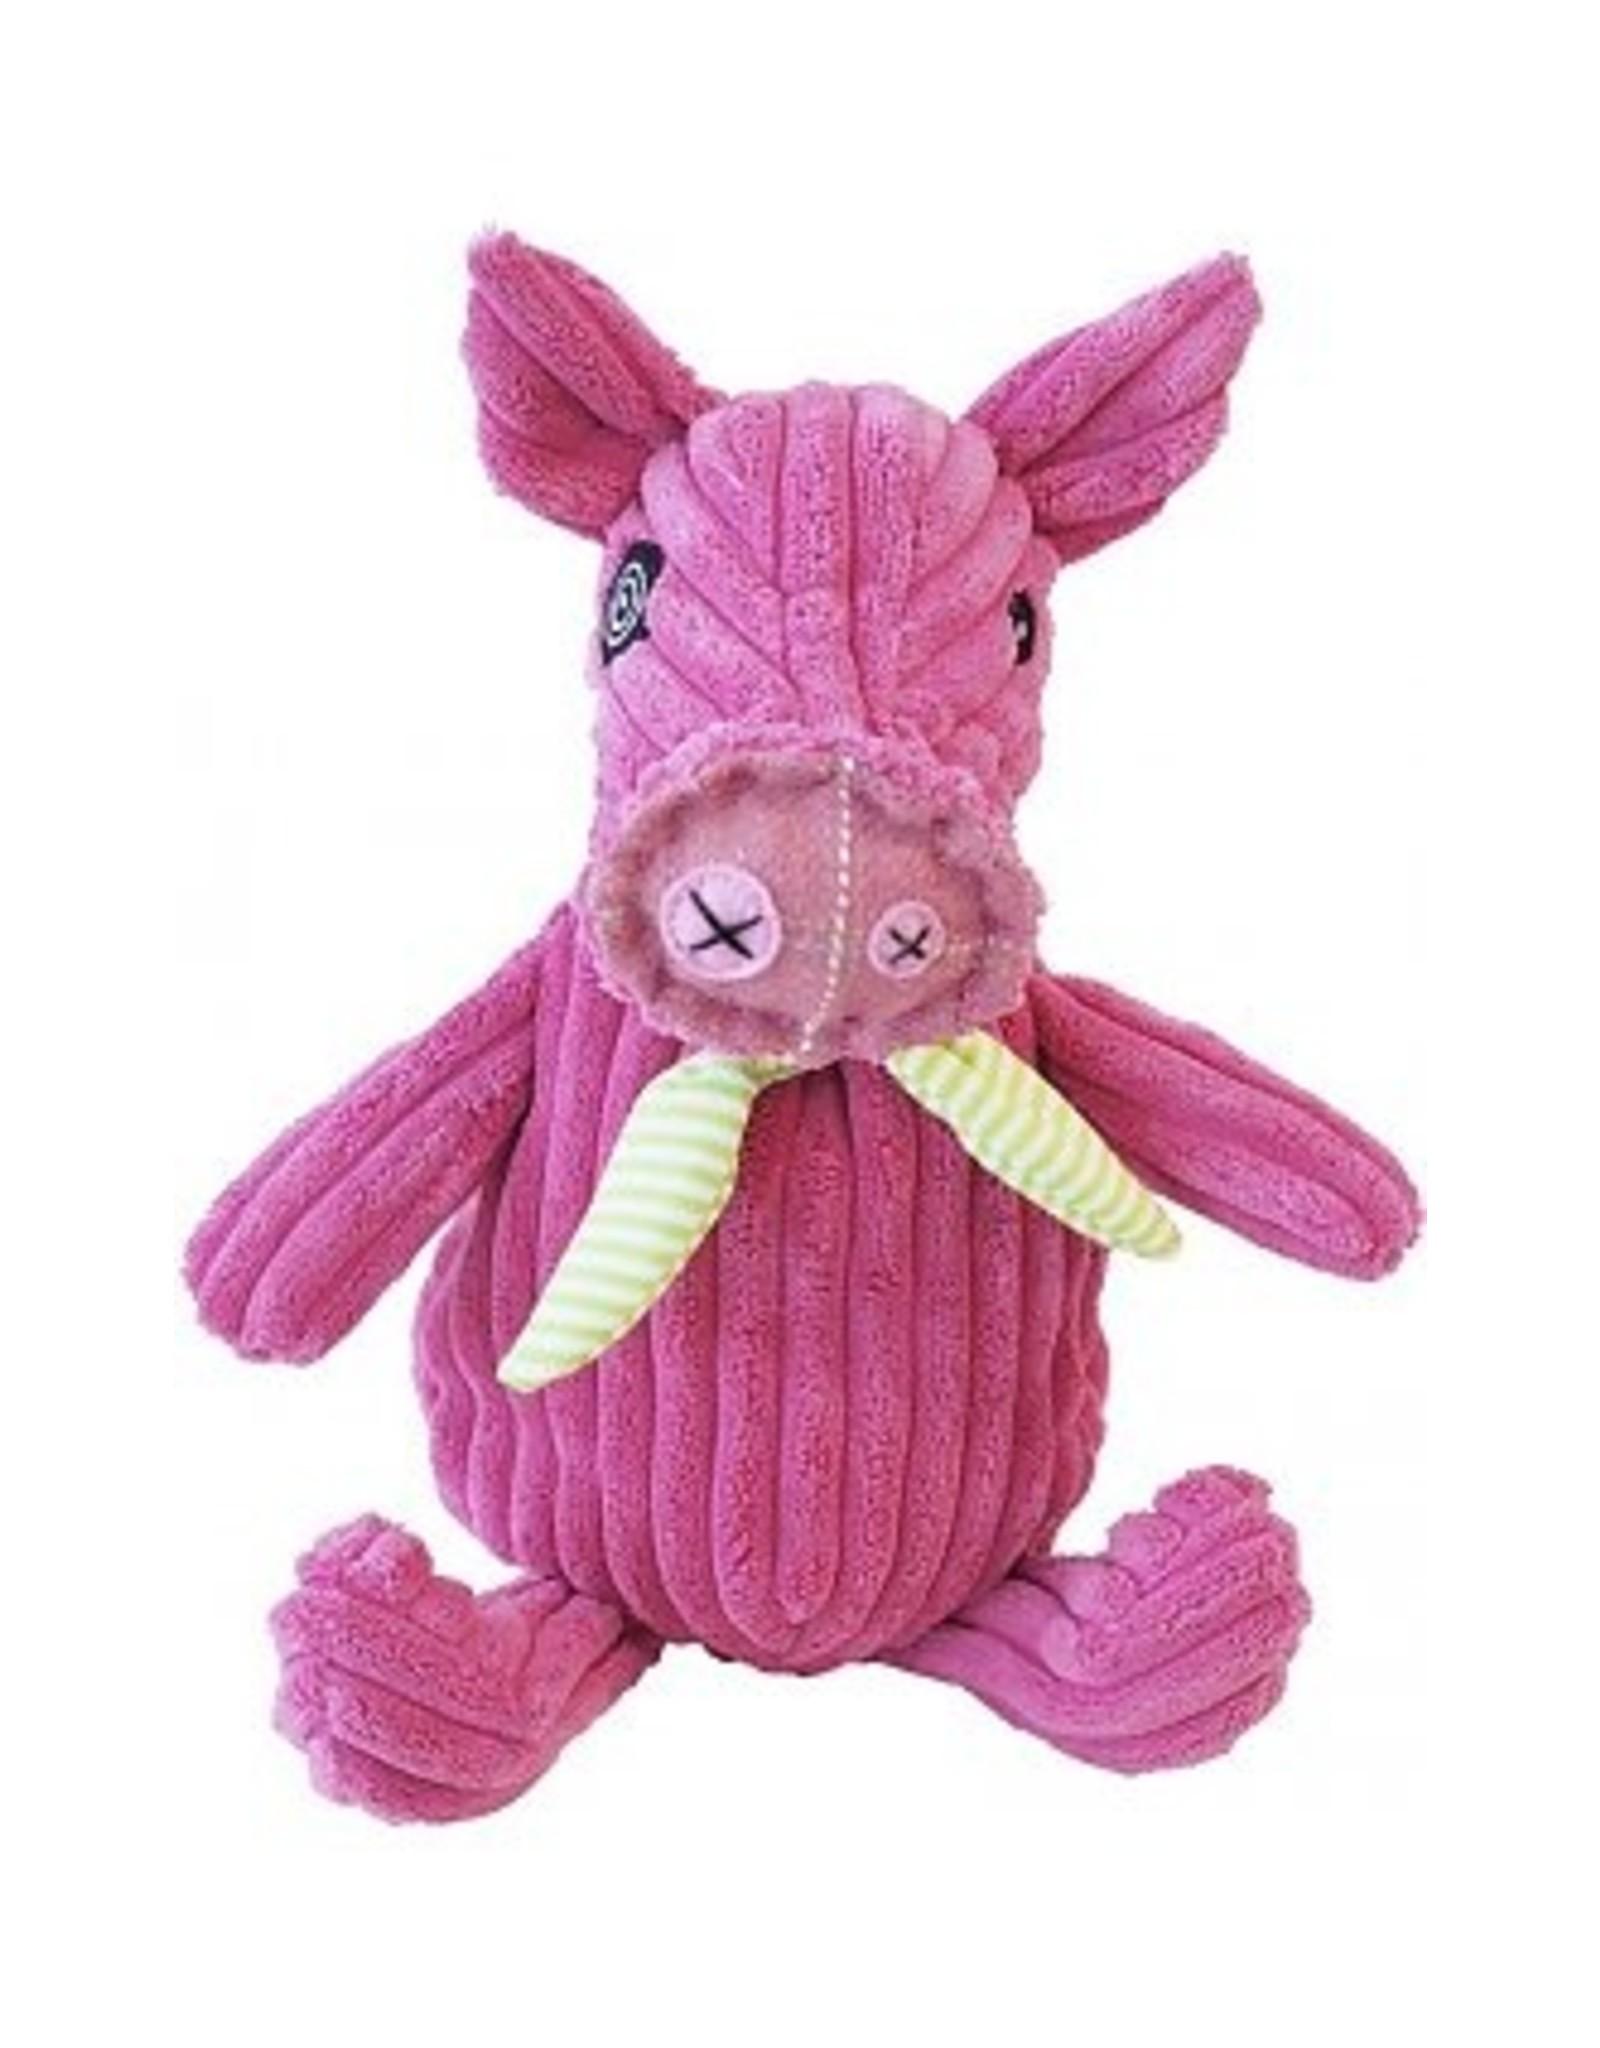 Deglingos stuffed animal - Jambonos the pig - simply collection